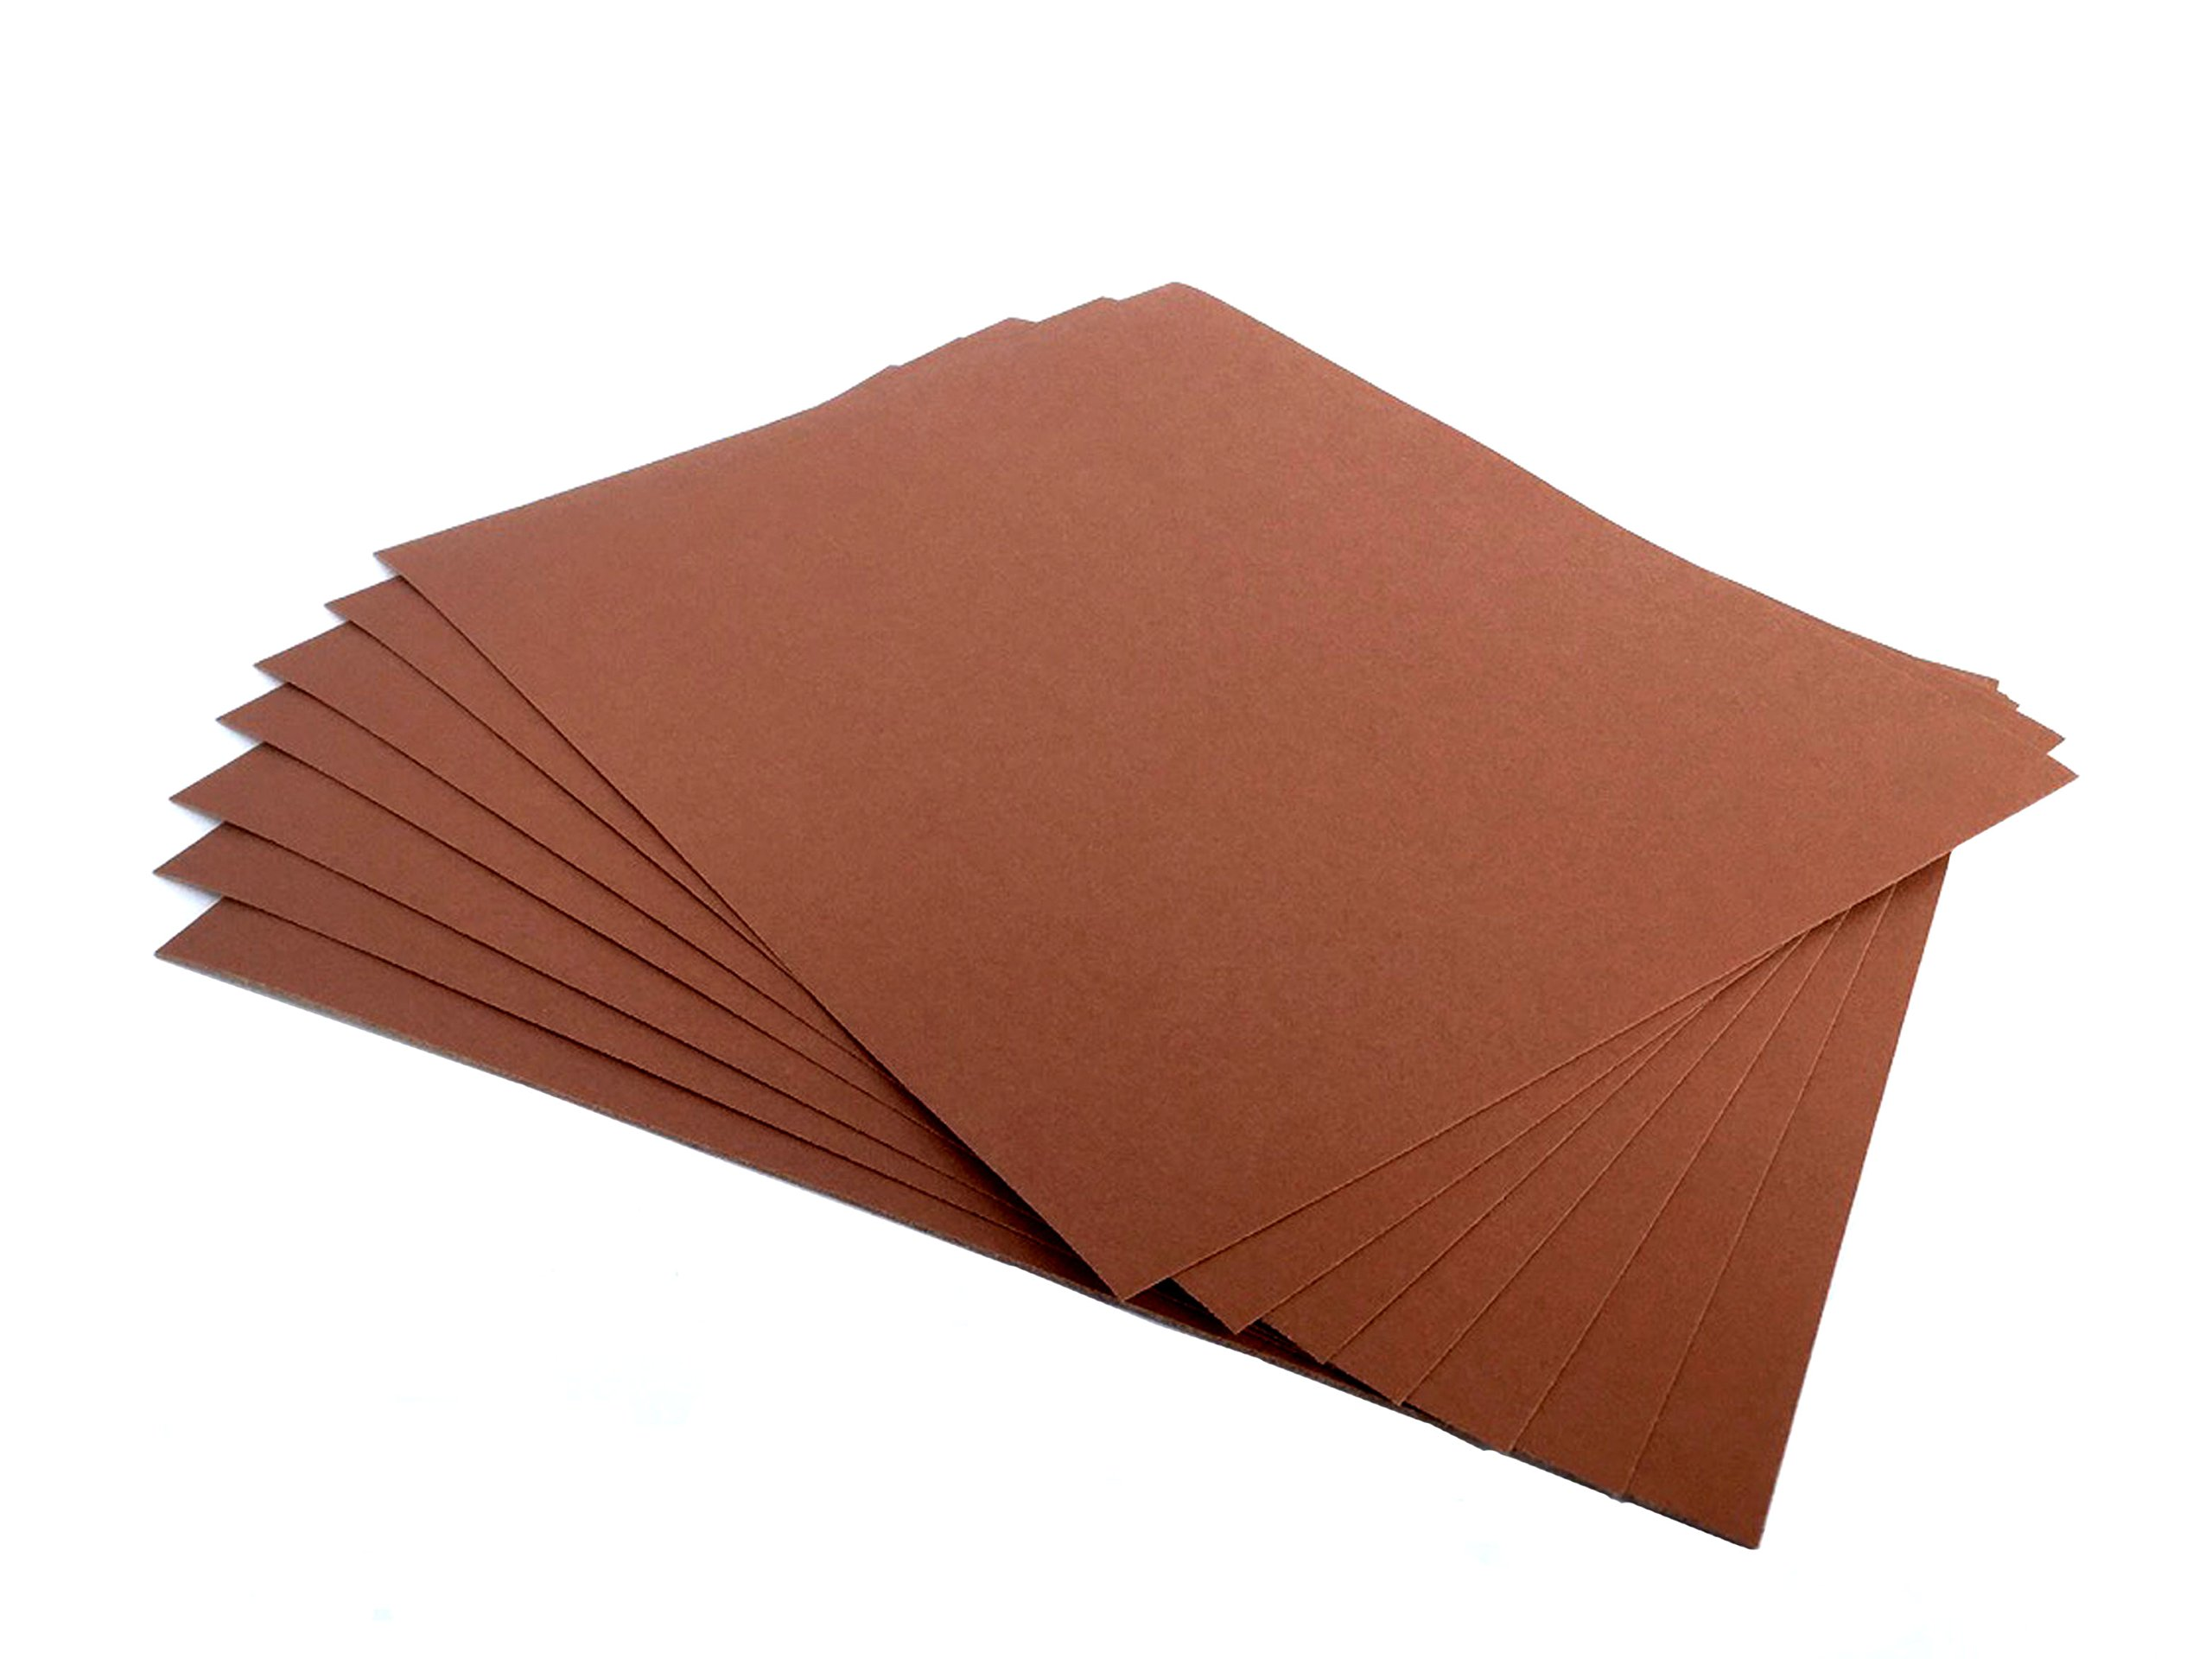 Sandpaper 9 x 11 General Sanding Aluminum Oxide, 50 Pack (220 Grit)